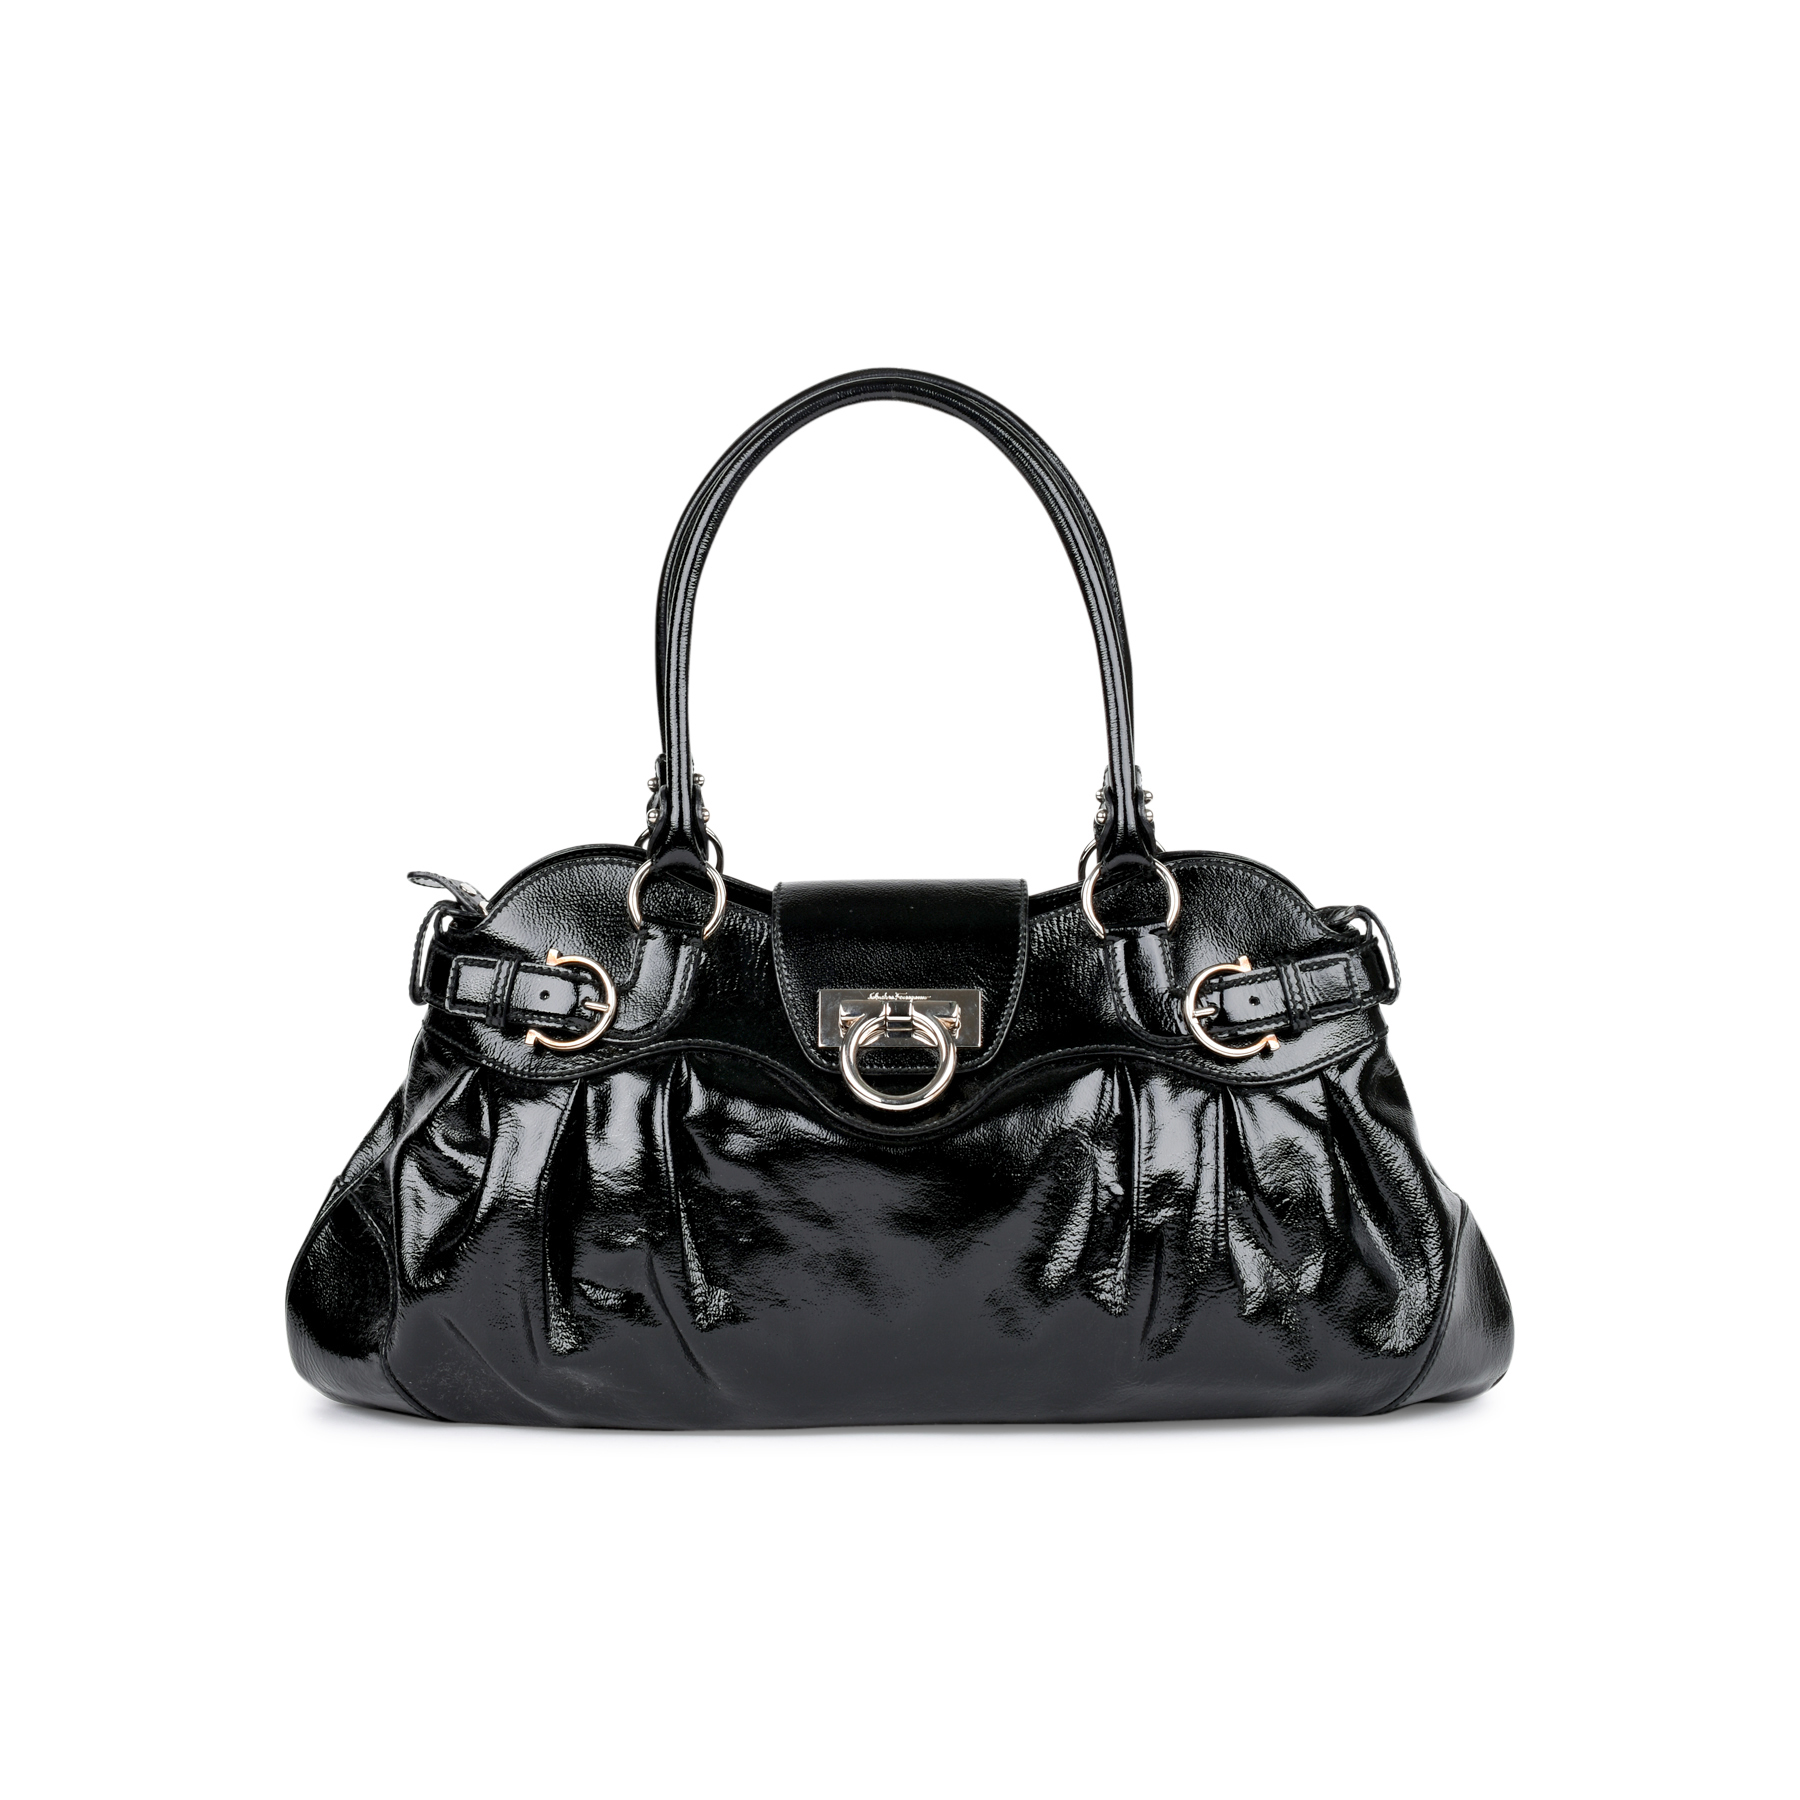 b21c2d61bf15 Authentic Second Hand Salvatore Ferragamo Marisa Shoulder Bag  (PSS-460-00009)